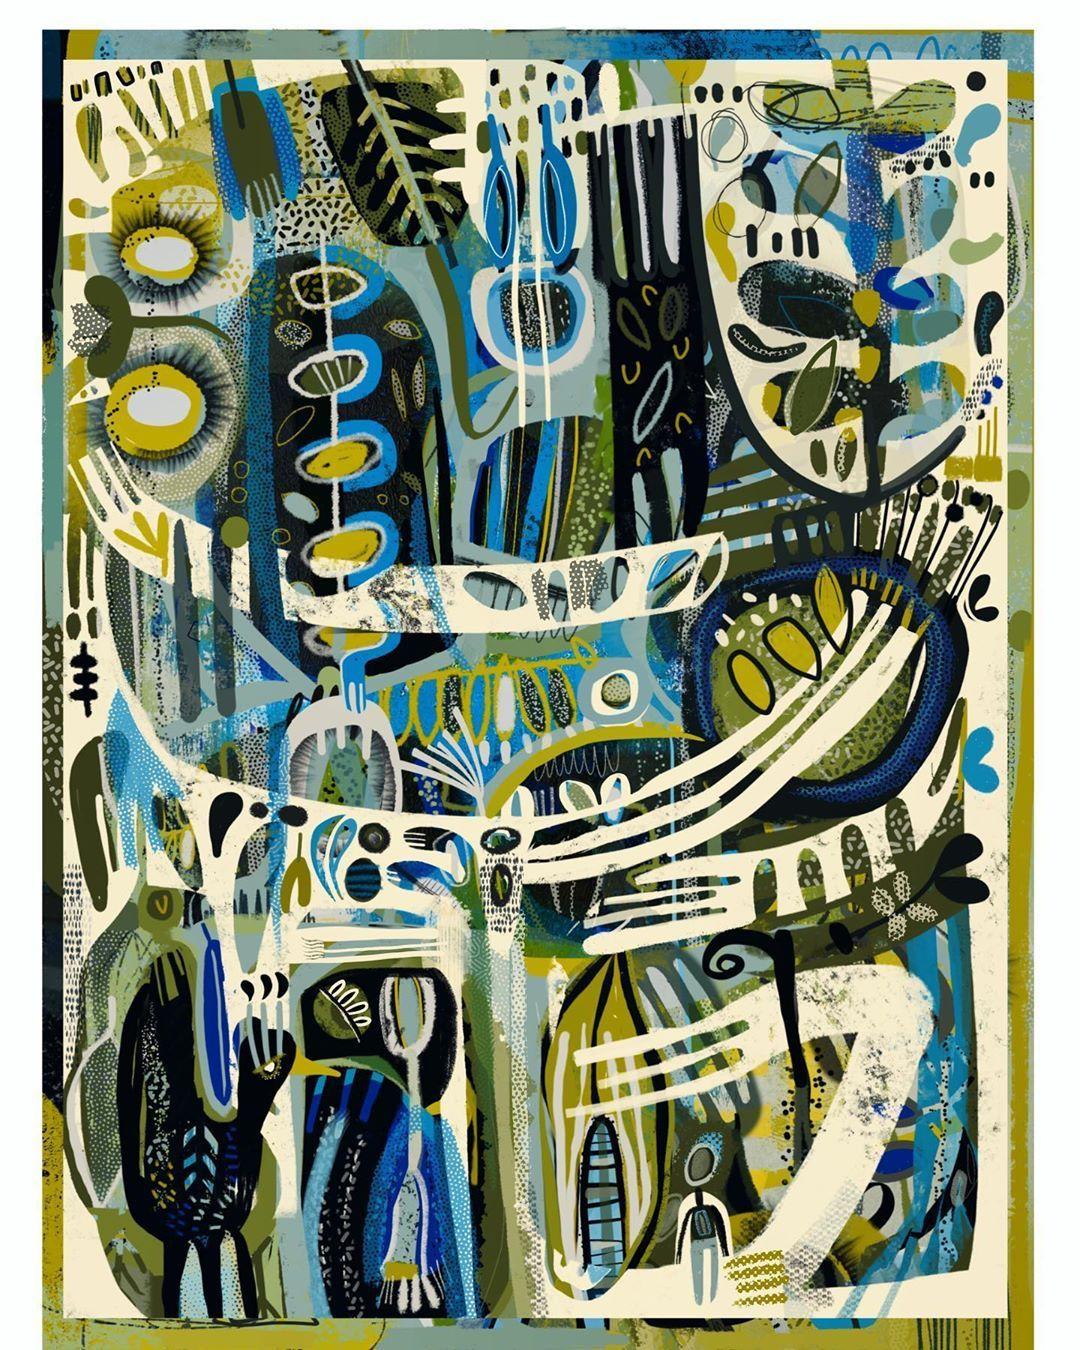 "Katfish - on Instagram: ""Digital art - #digitalart #procreateart #patterndesign #palette #botanical #abstractlandscape #surfacepatterndesign #printsforsale…"""